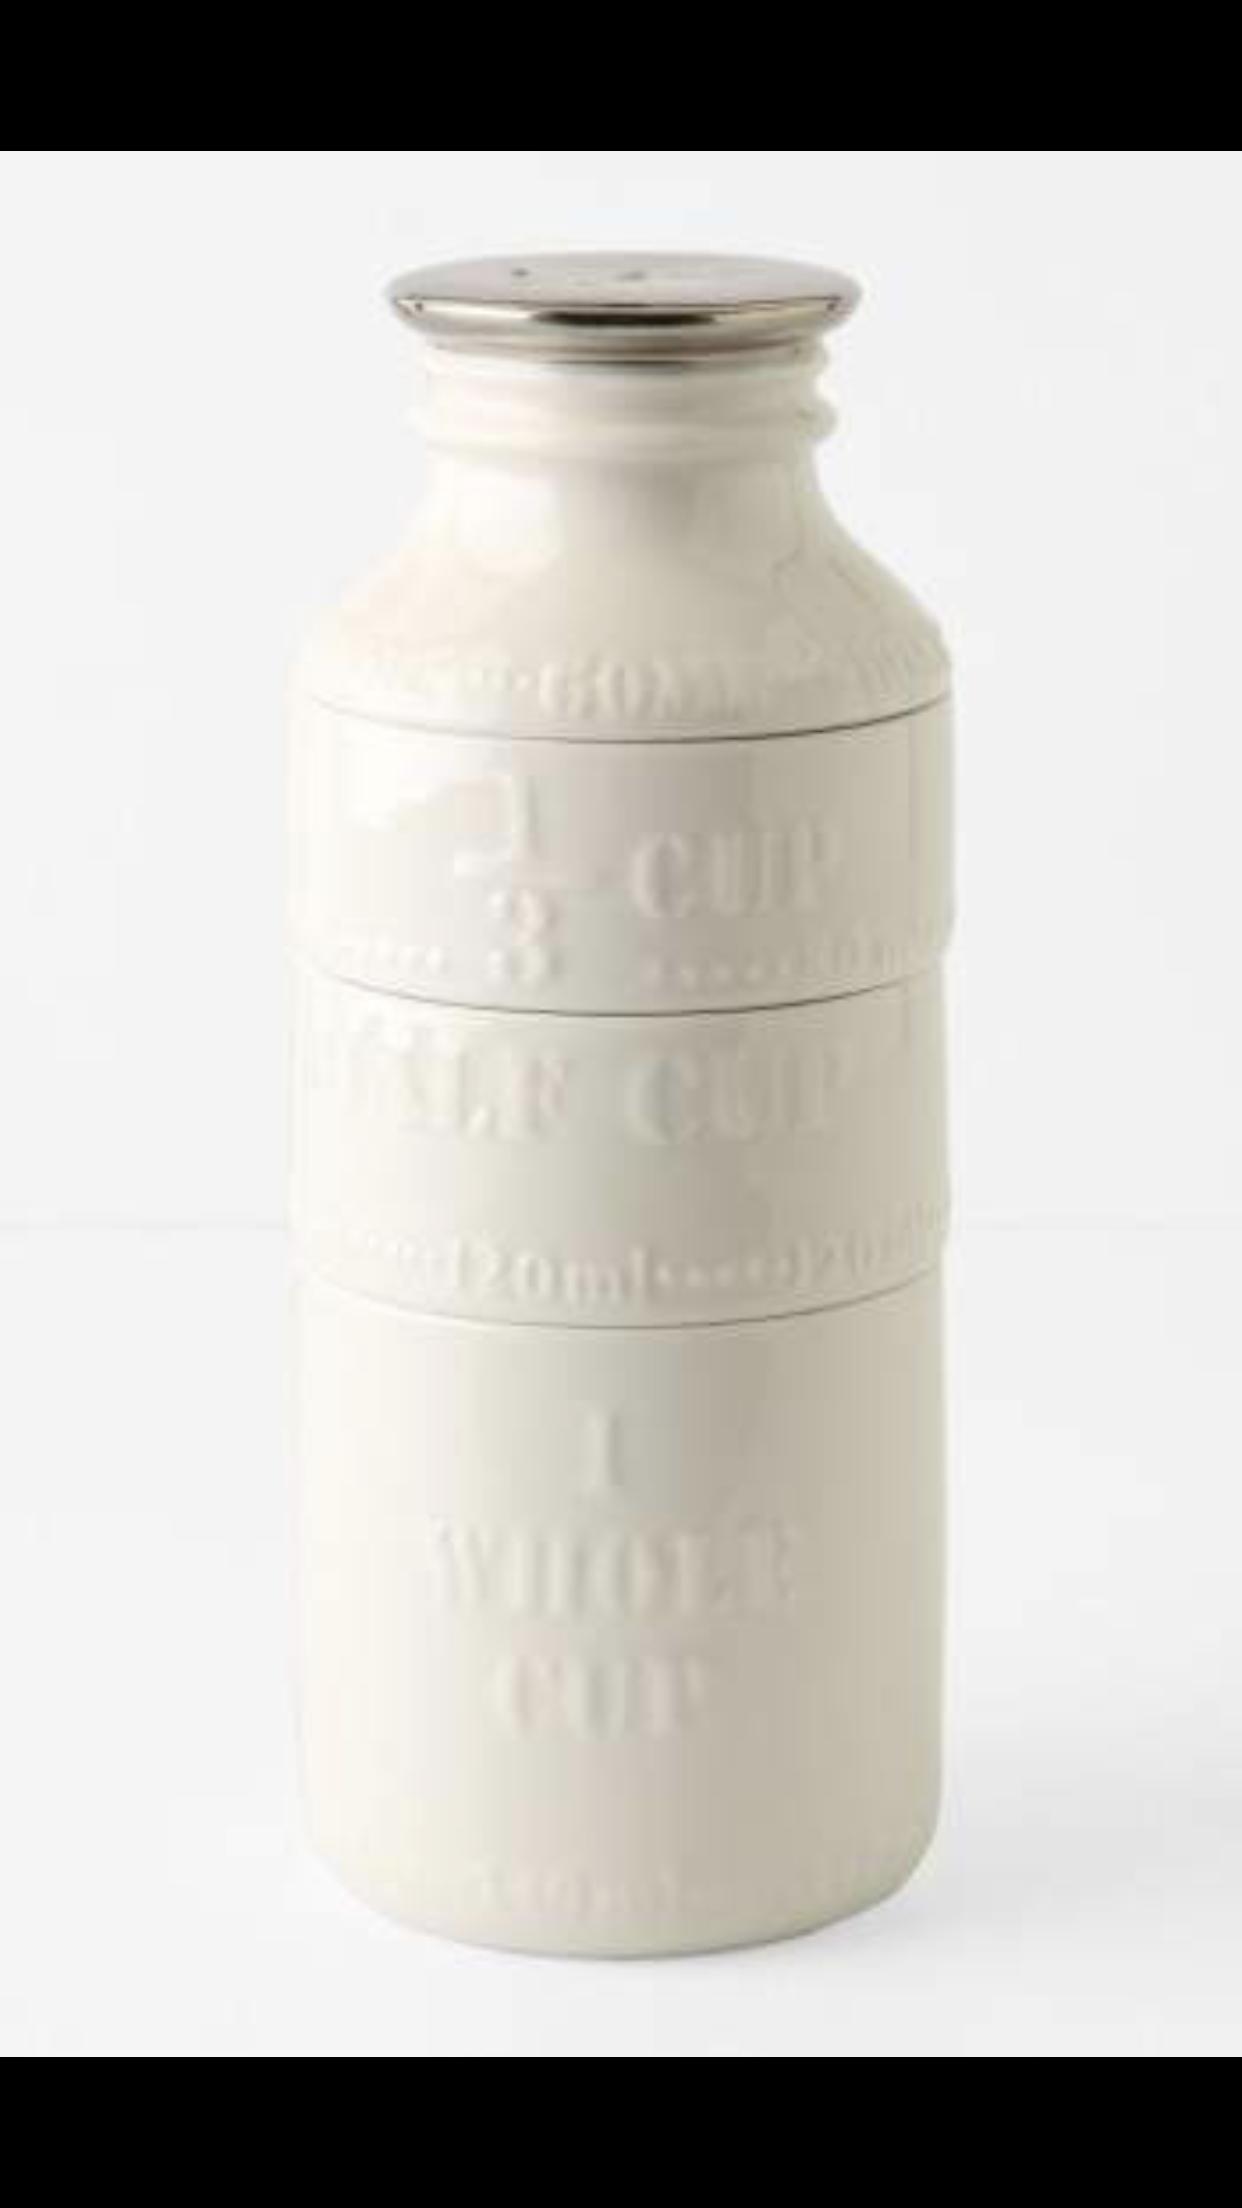 Anthropologie Milk Bottle Measuring Cups vintage chic